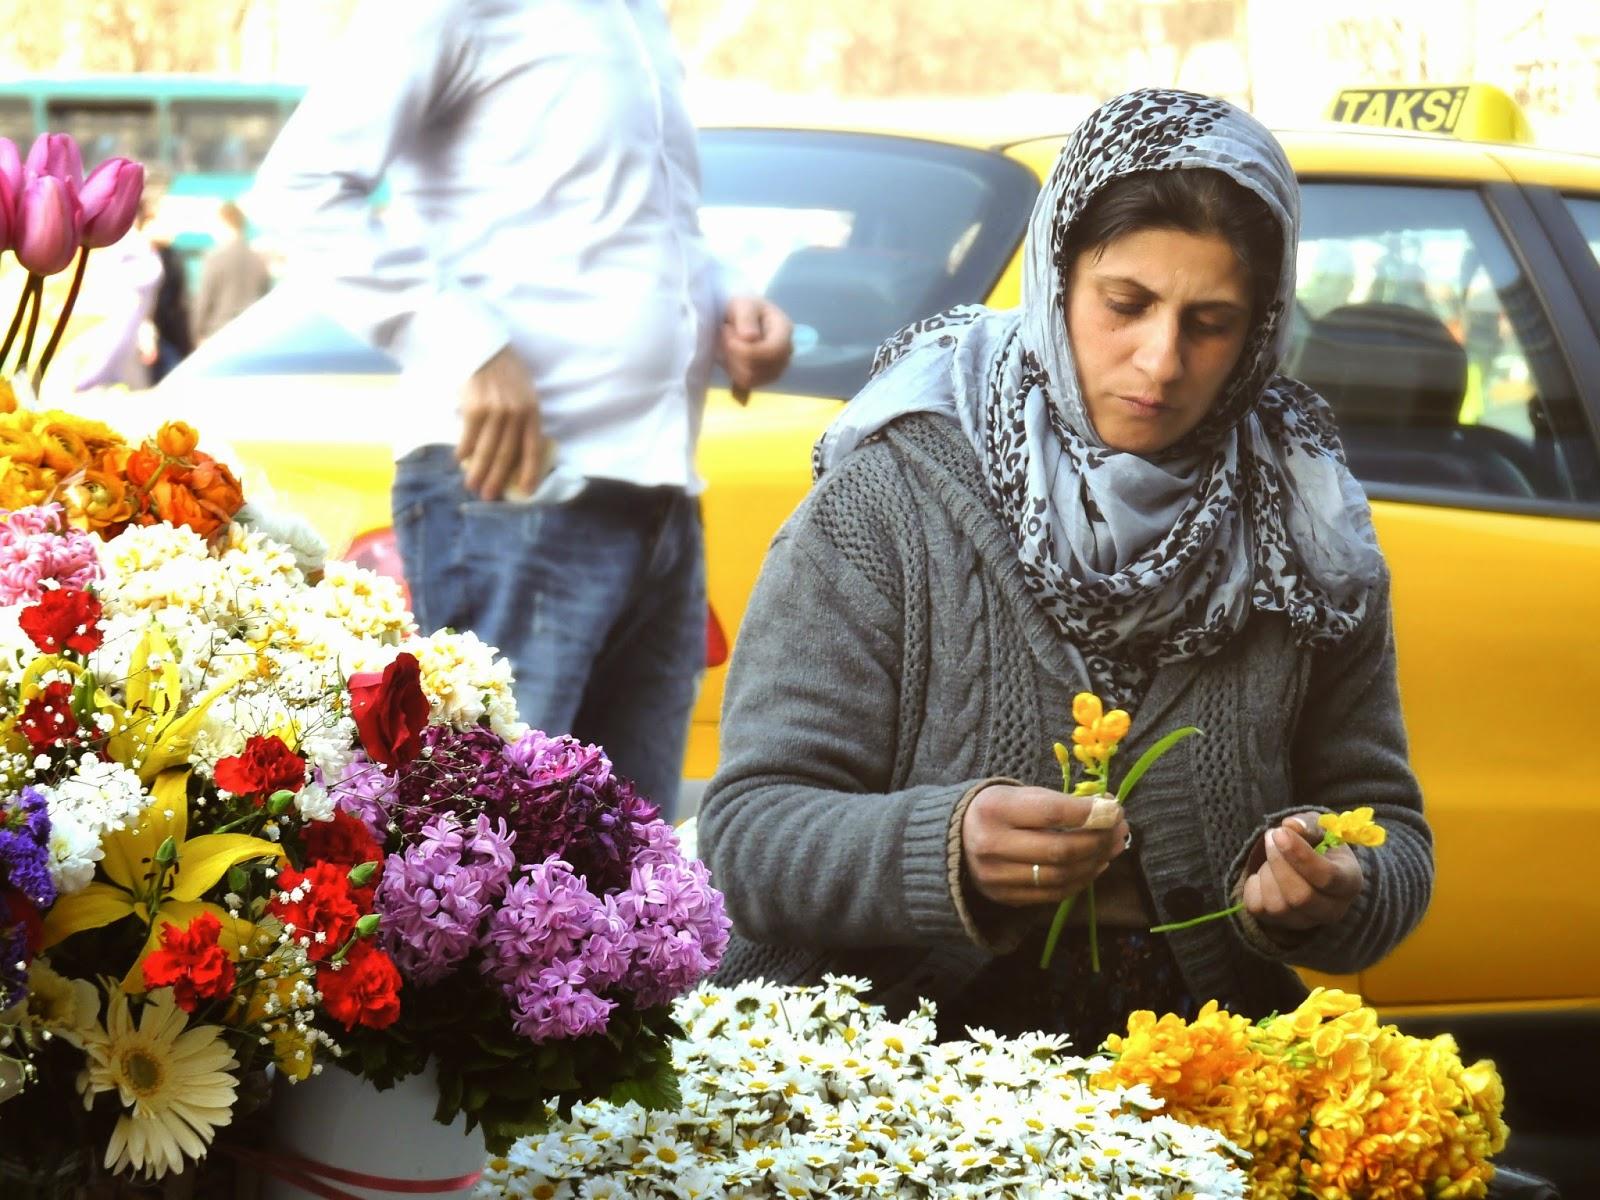 Venditrice di fiori a Taksim Square - foto di Elisa Chisana Hoshi